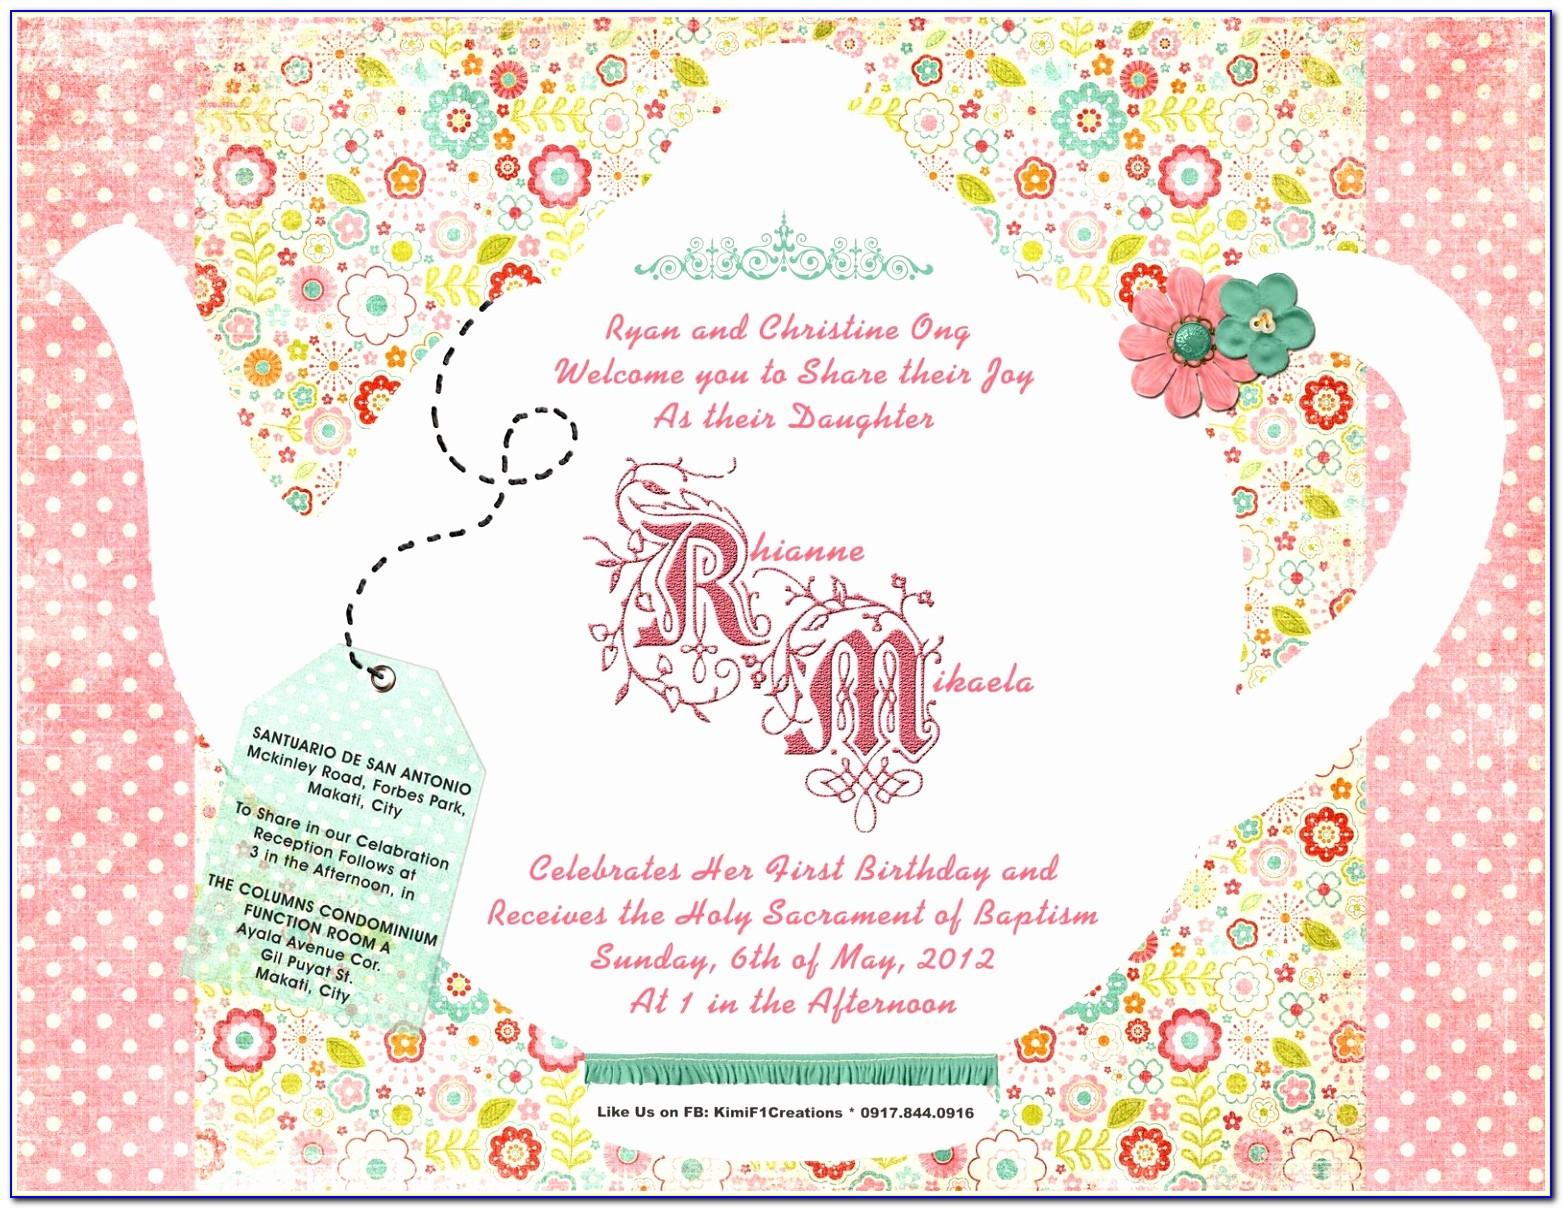 Tea Party Invitation Template Design Vintage Party Invitation Templates Lovely Pdf Word Excel Download Templates Paete